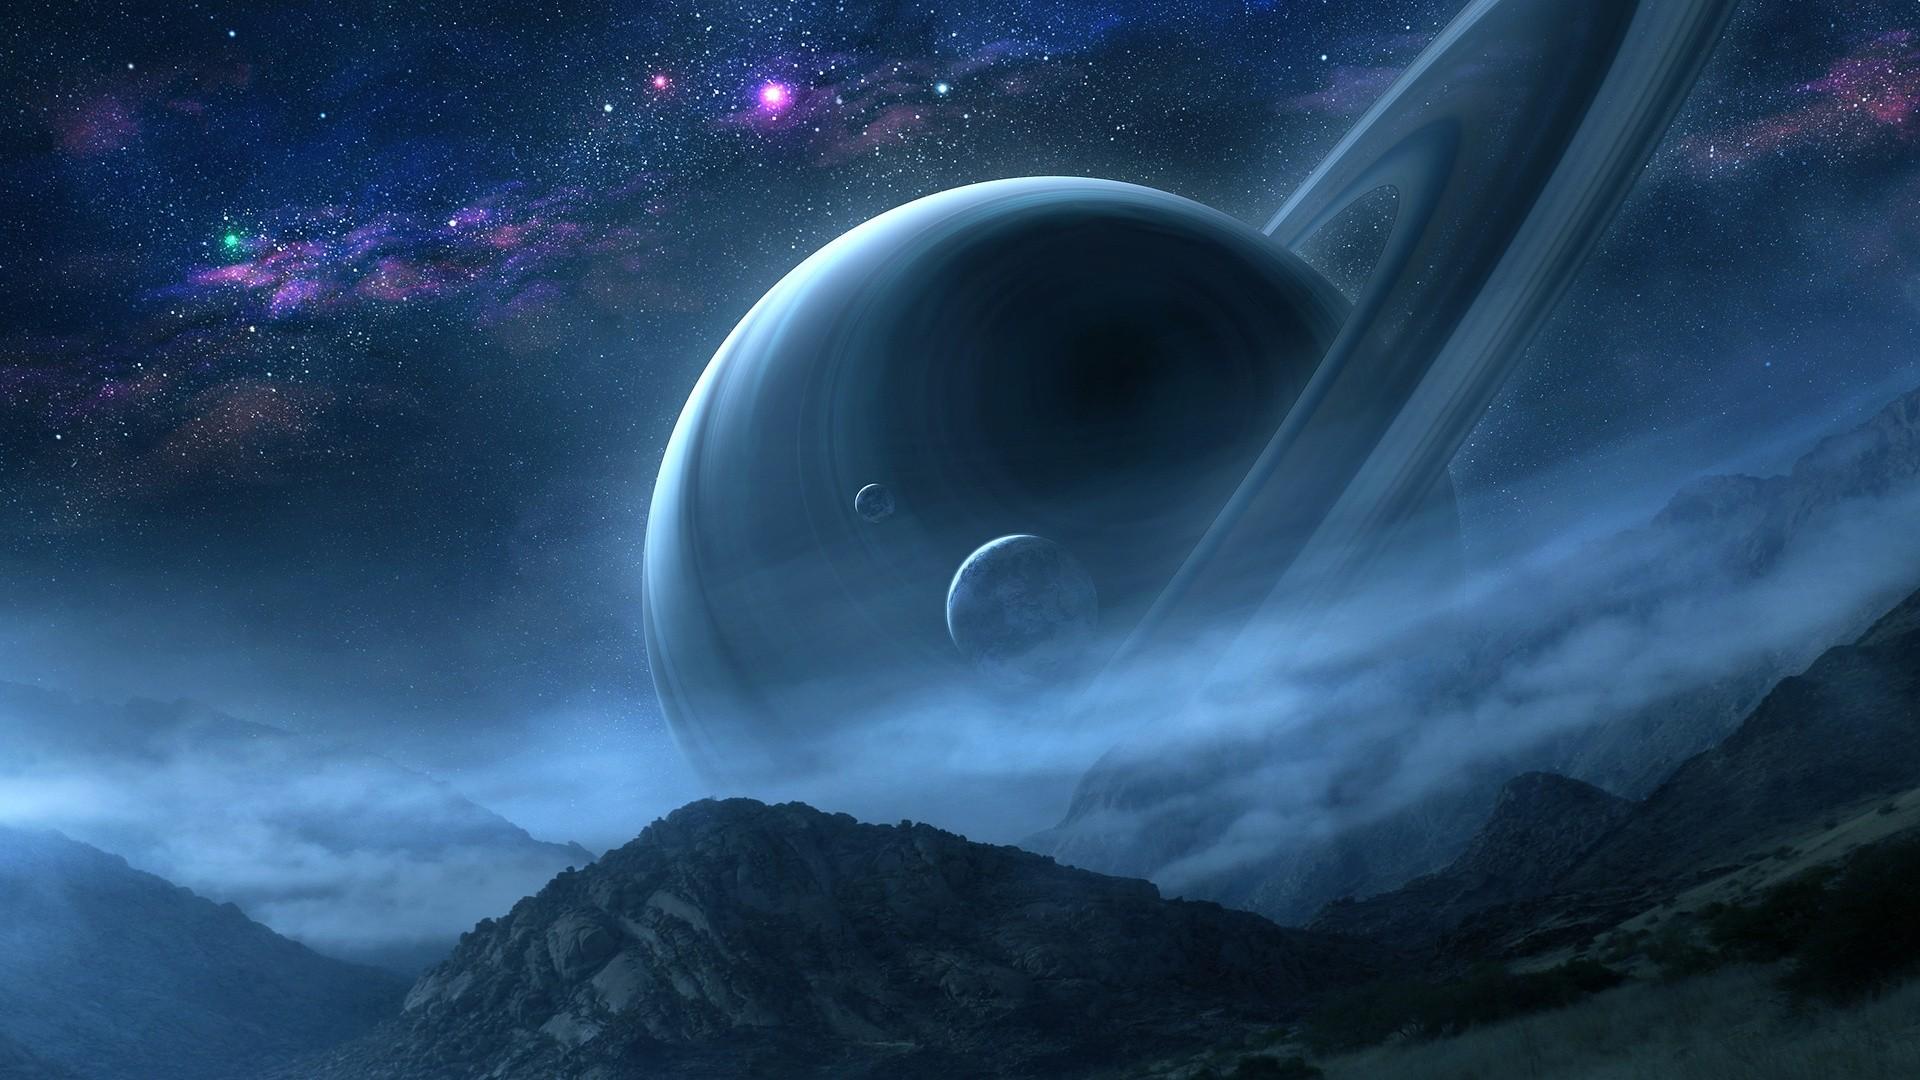 Saturn full hd wallpaper